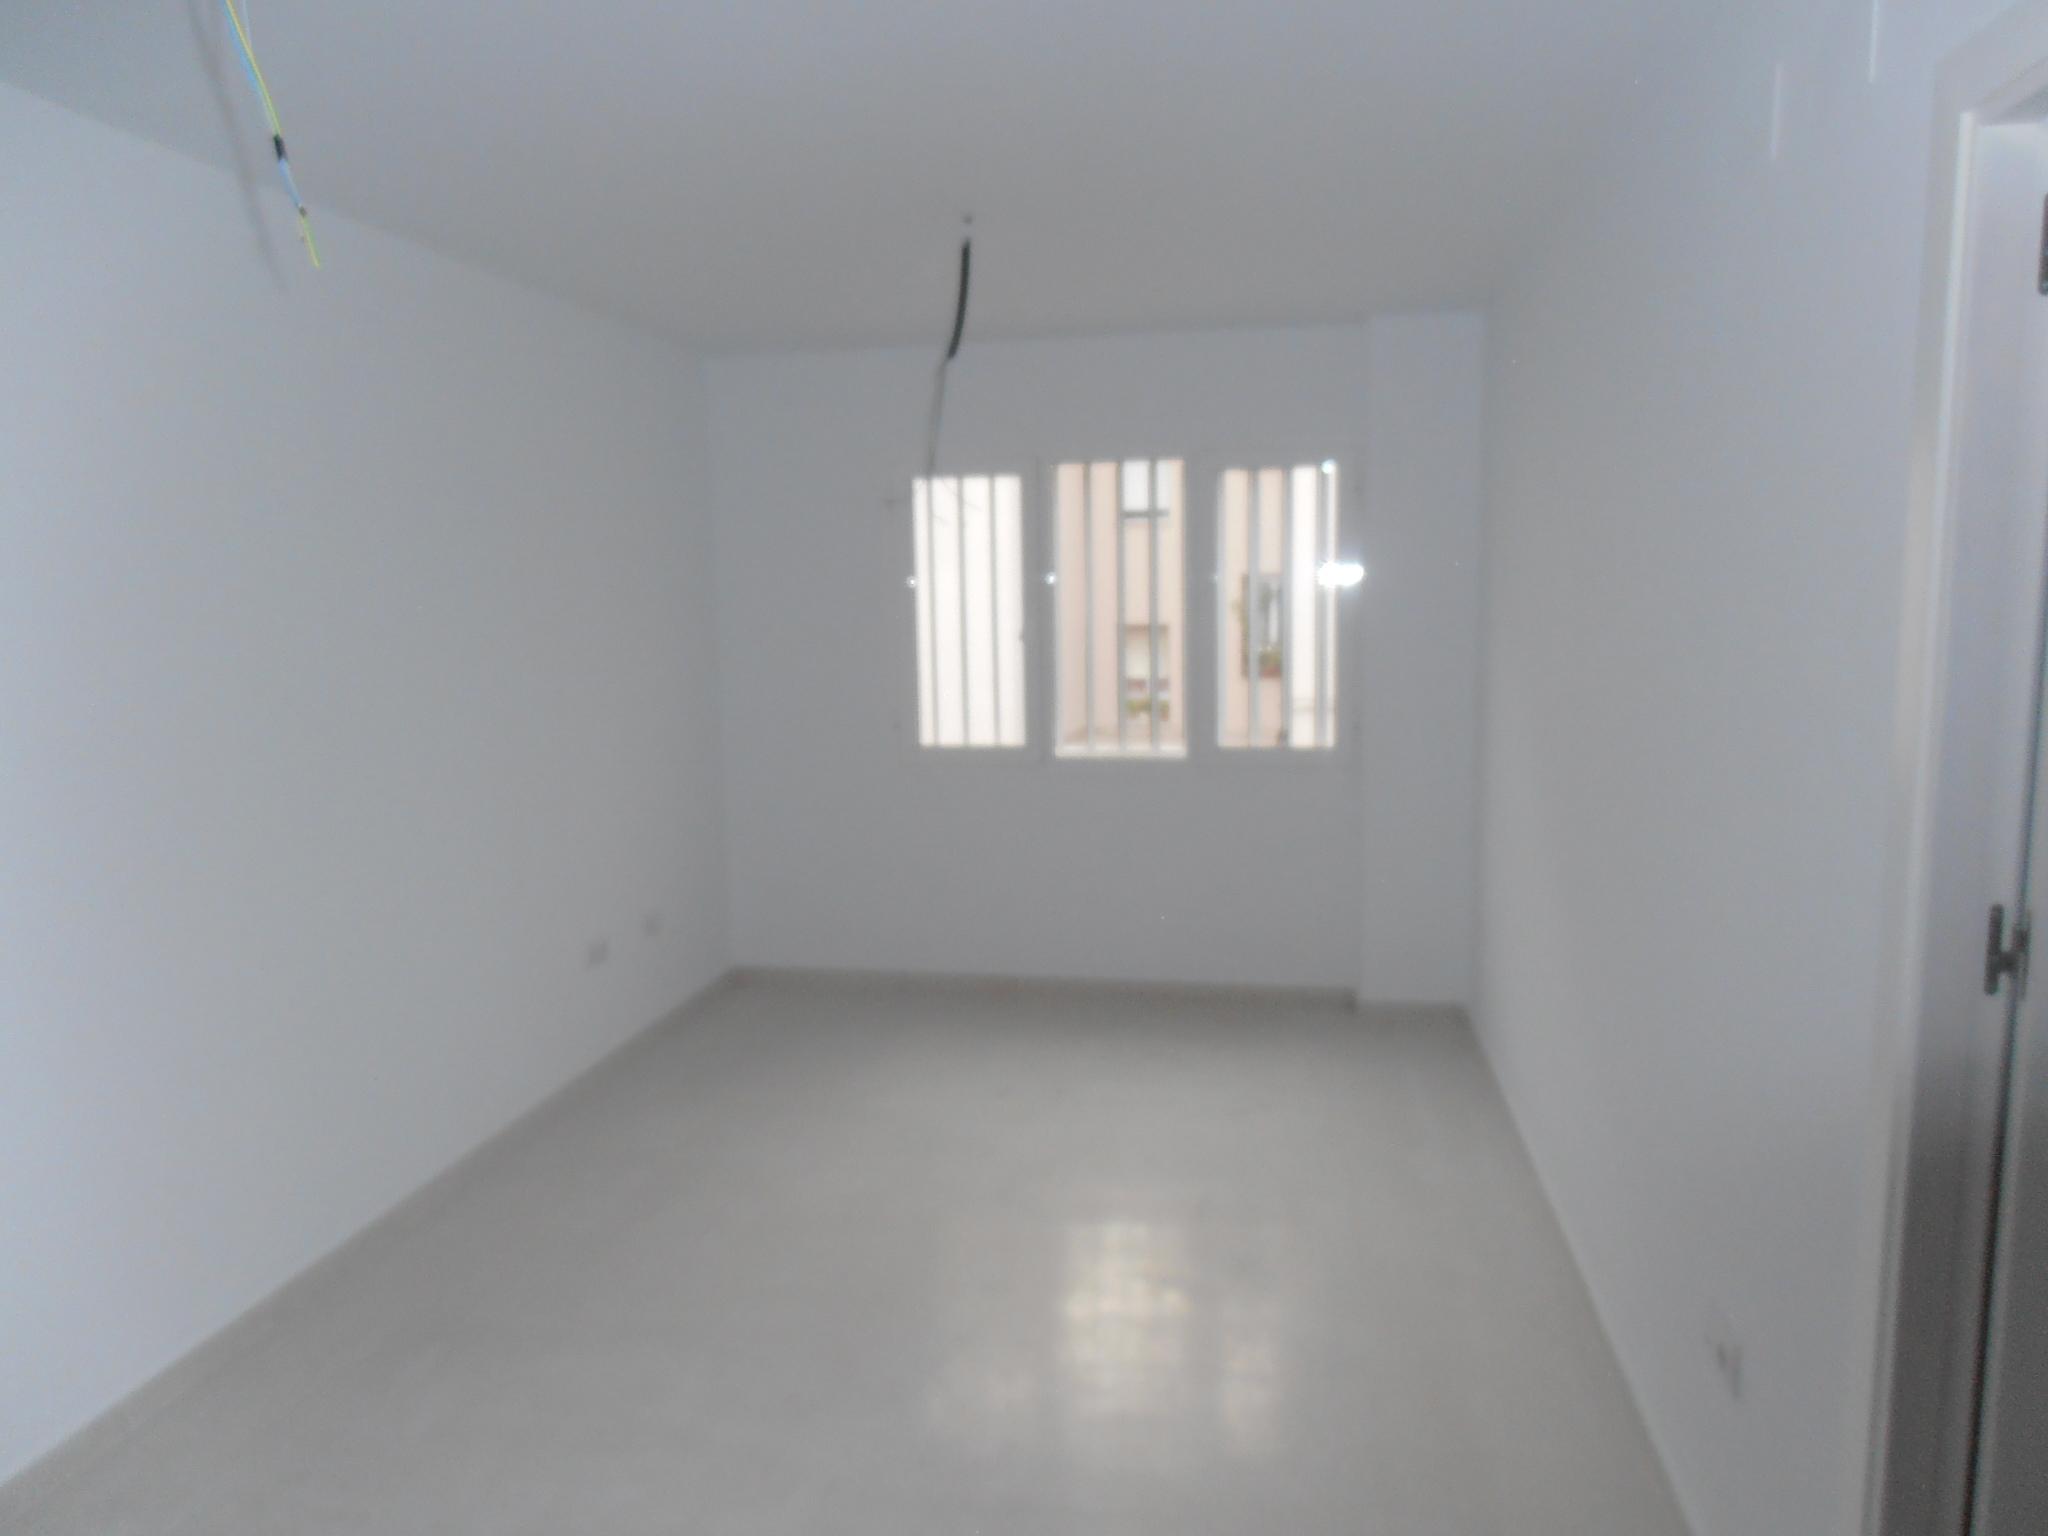 Apartamento letra e promoci n de viviendas en jerez - Pisos de bancos jerez ...